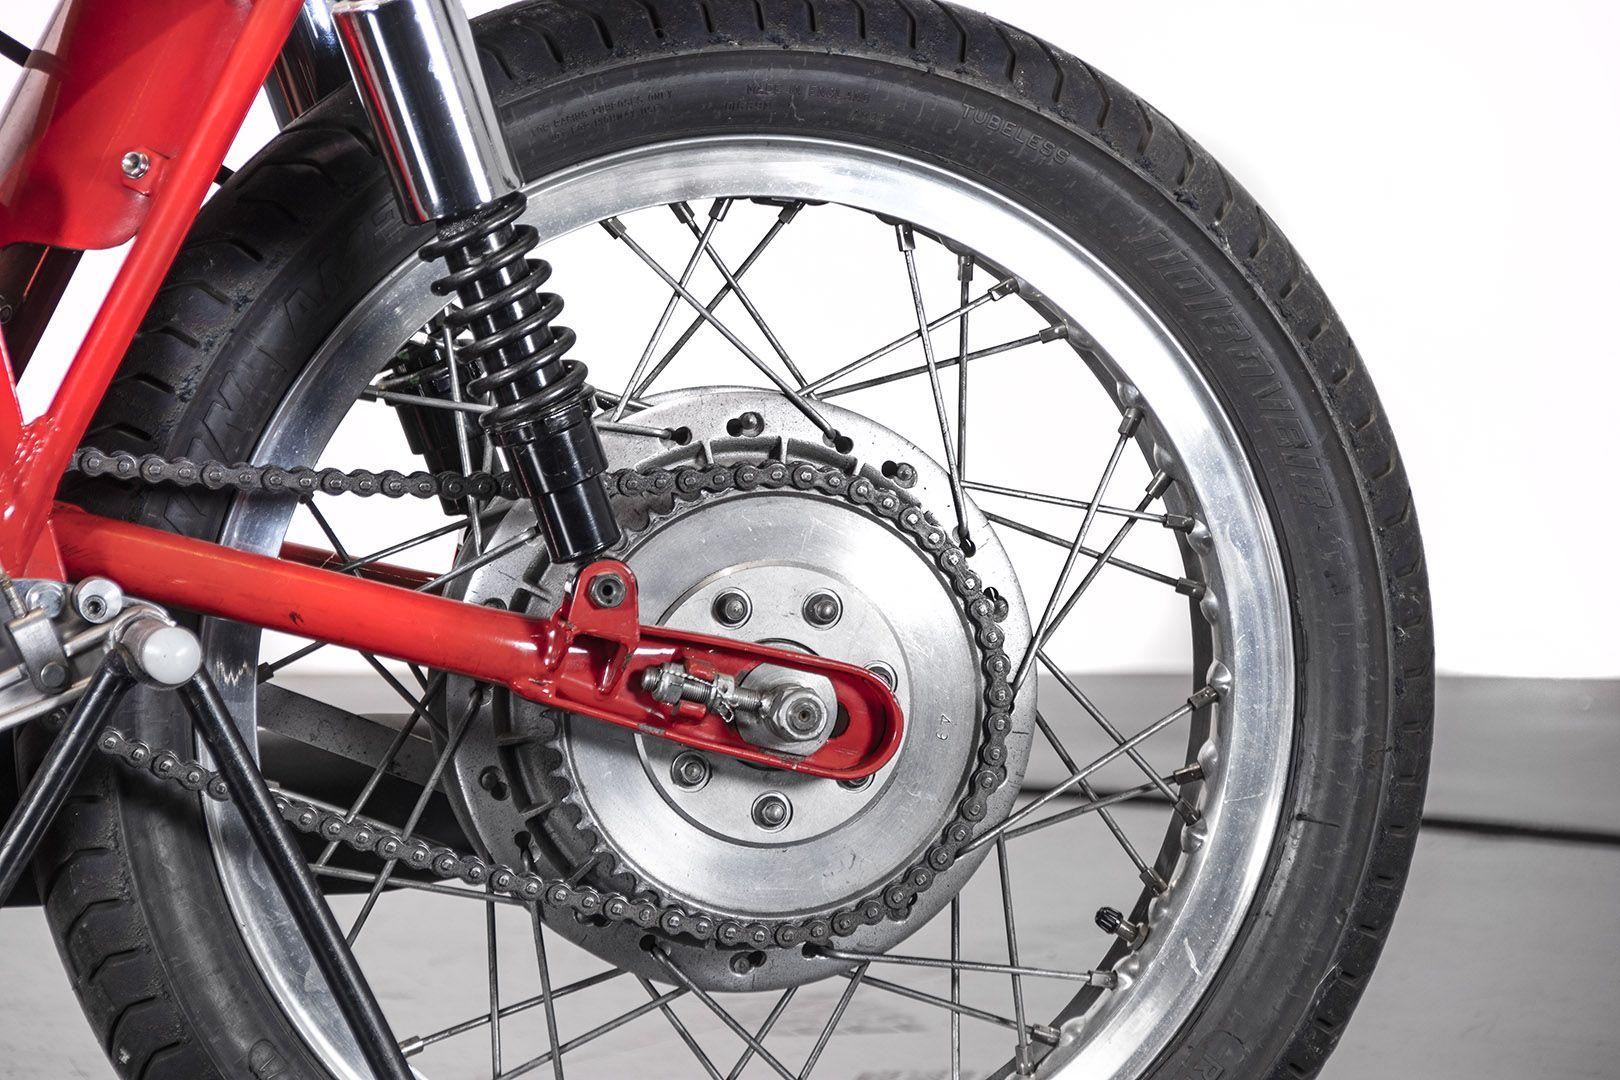 1969 Aermacchi Harley-Davidson 350 Ala d'oro 61121